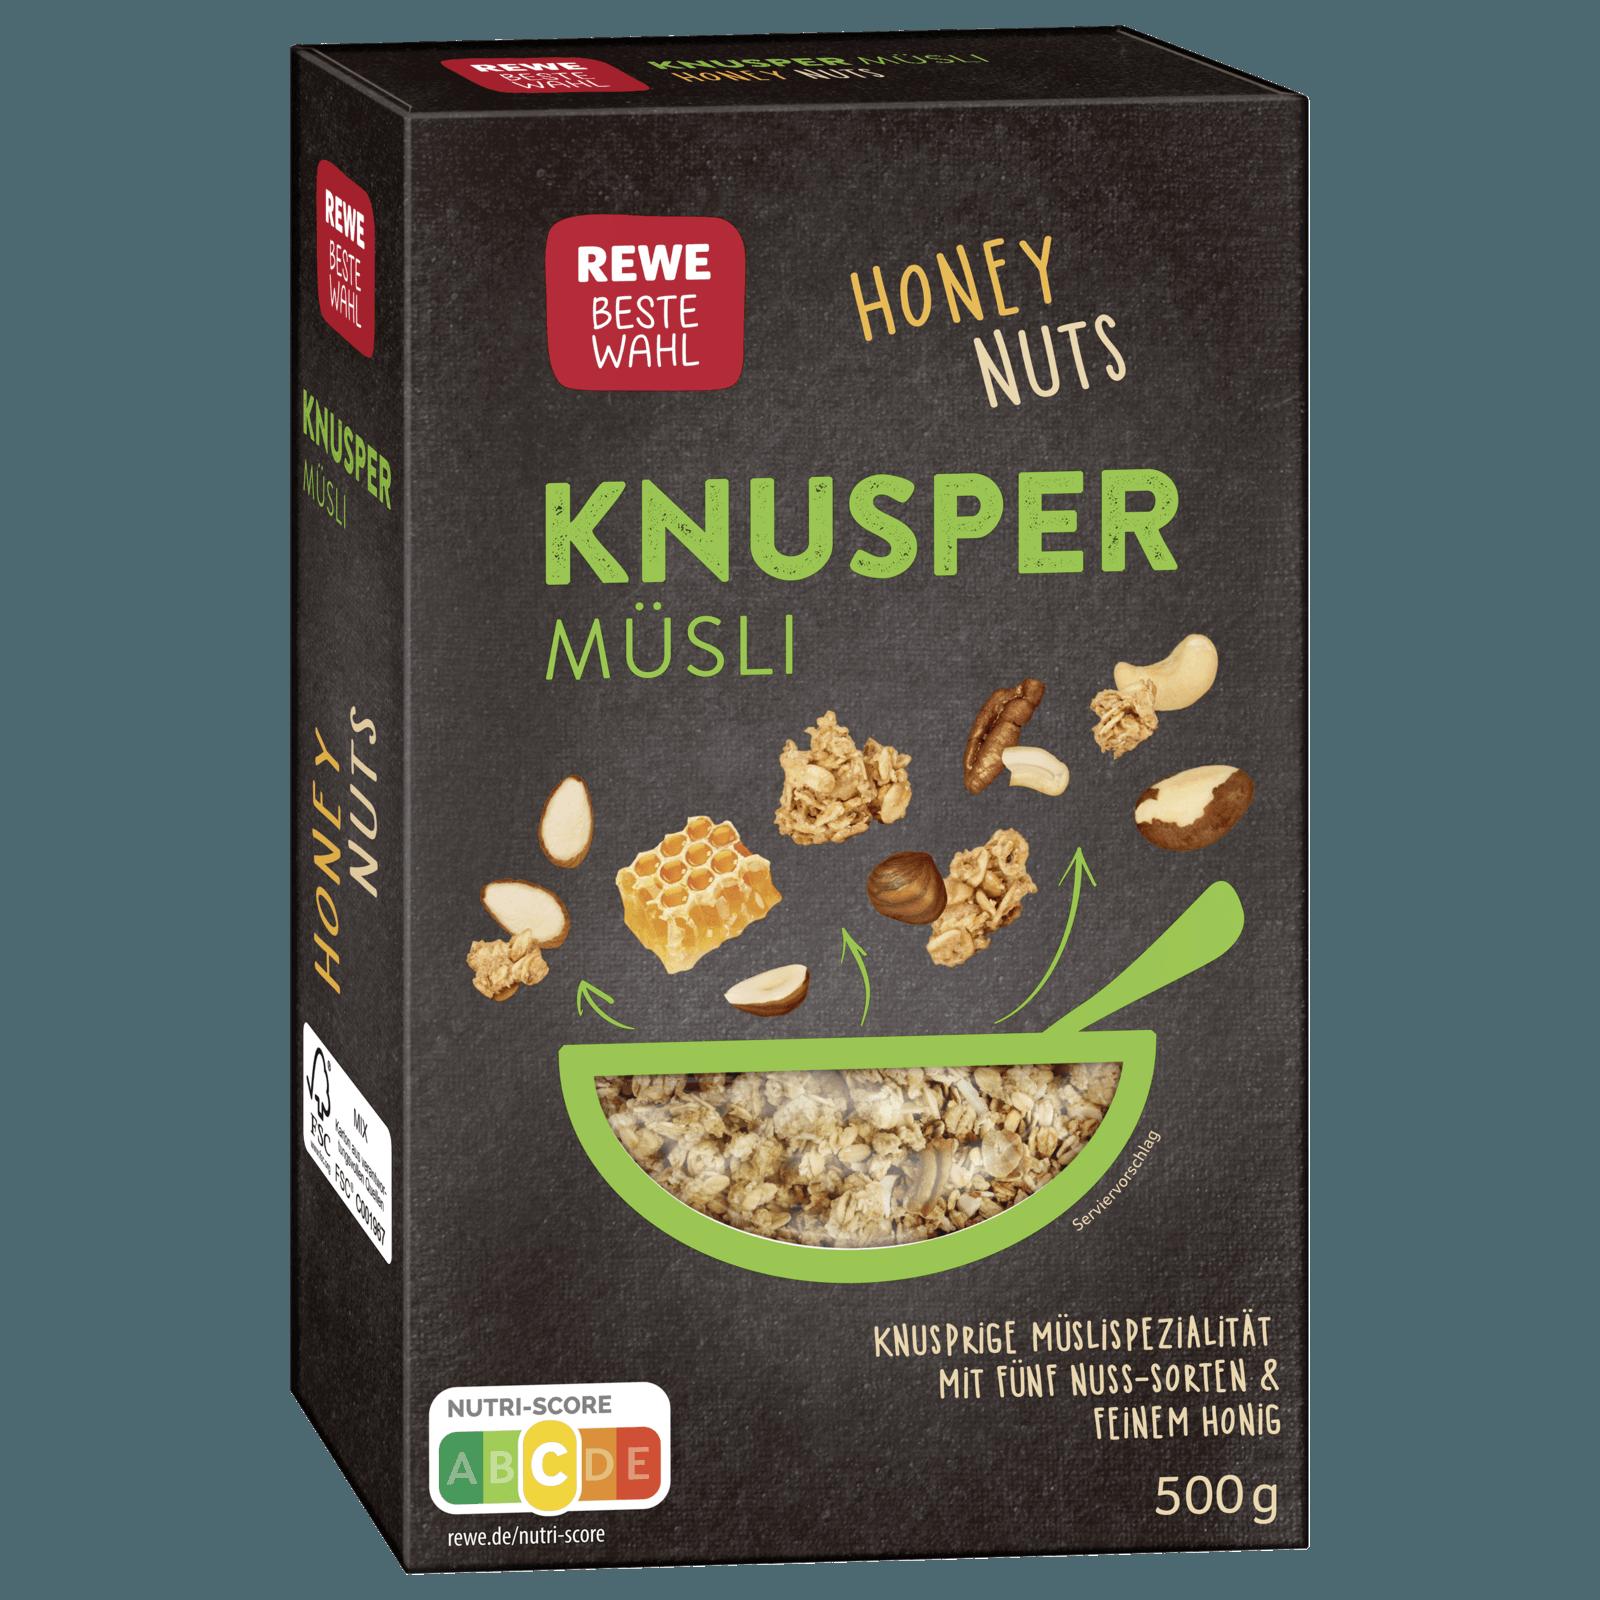 Rewe Beste Wahl Knusper Musli Honig Nuss 500g Bei Rewe Online Bestellen